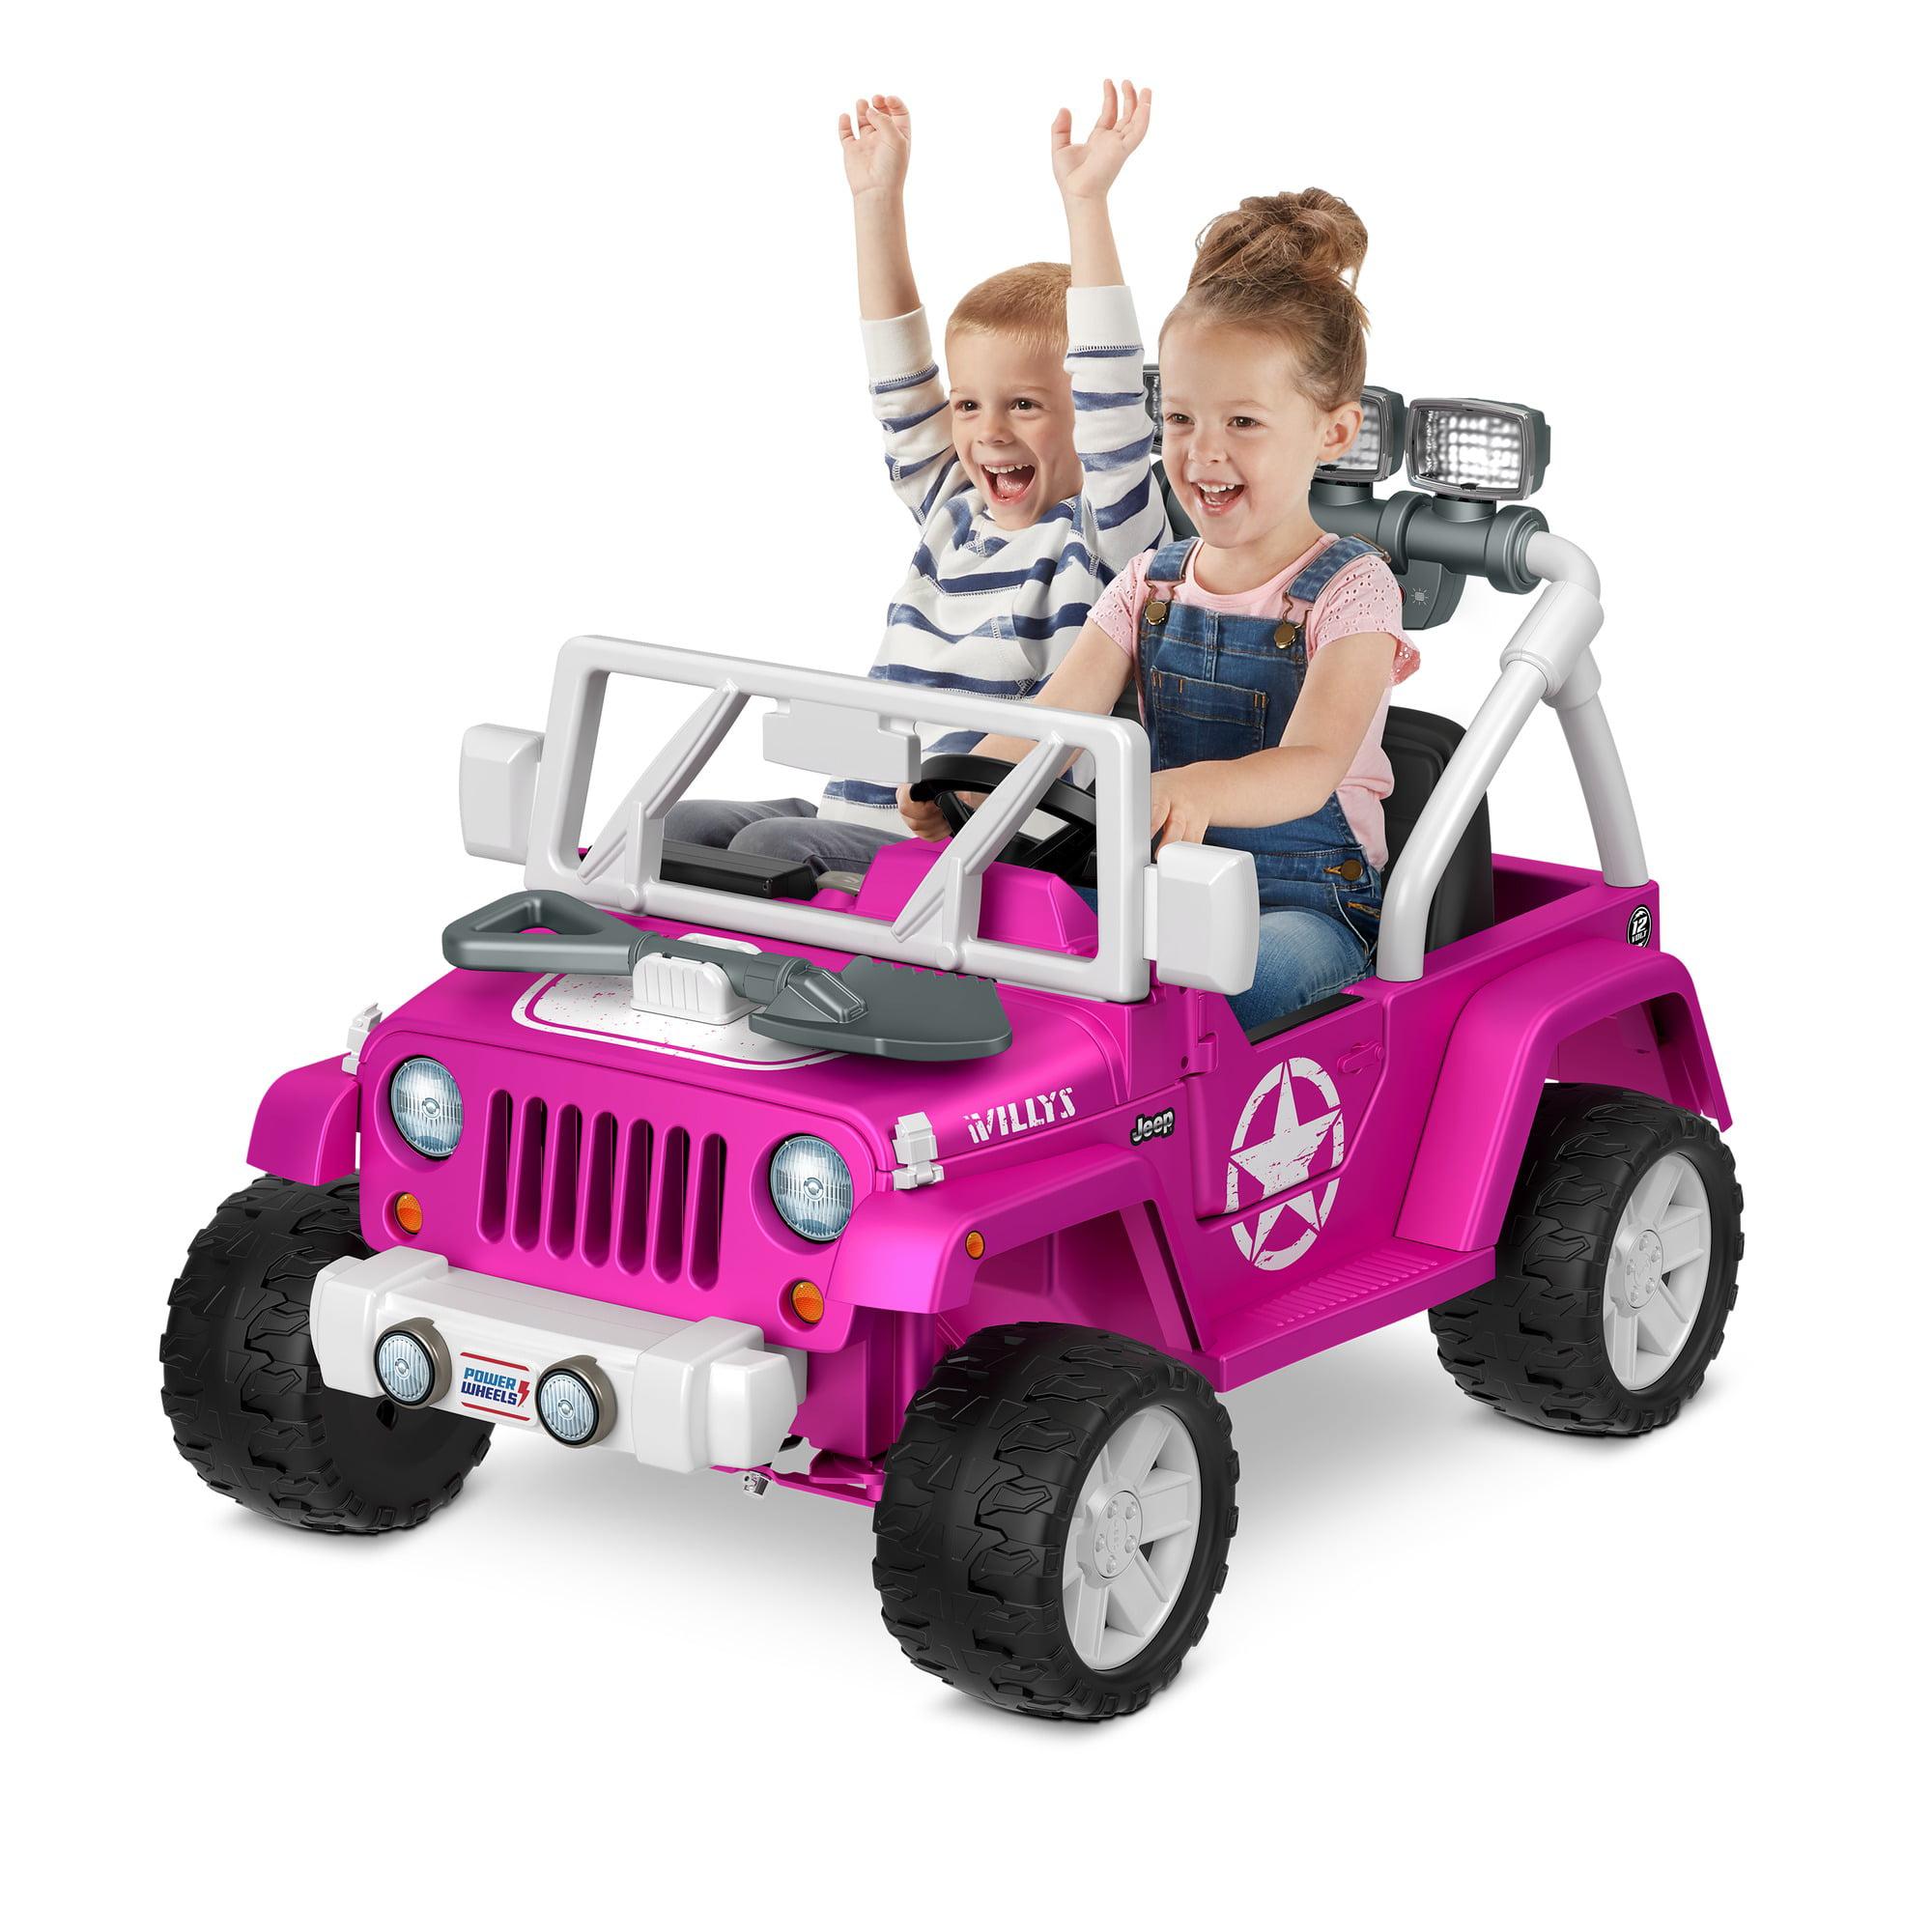 Power Wheels Jeep Wrangler Willys Pink Ride On Vehicle Walmart Com Walmart Com